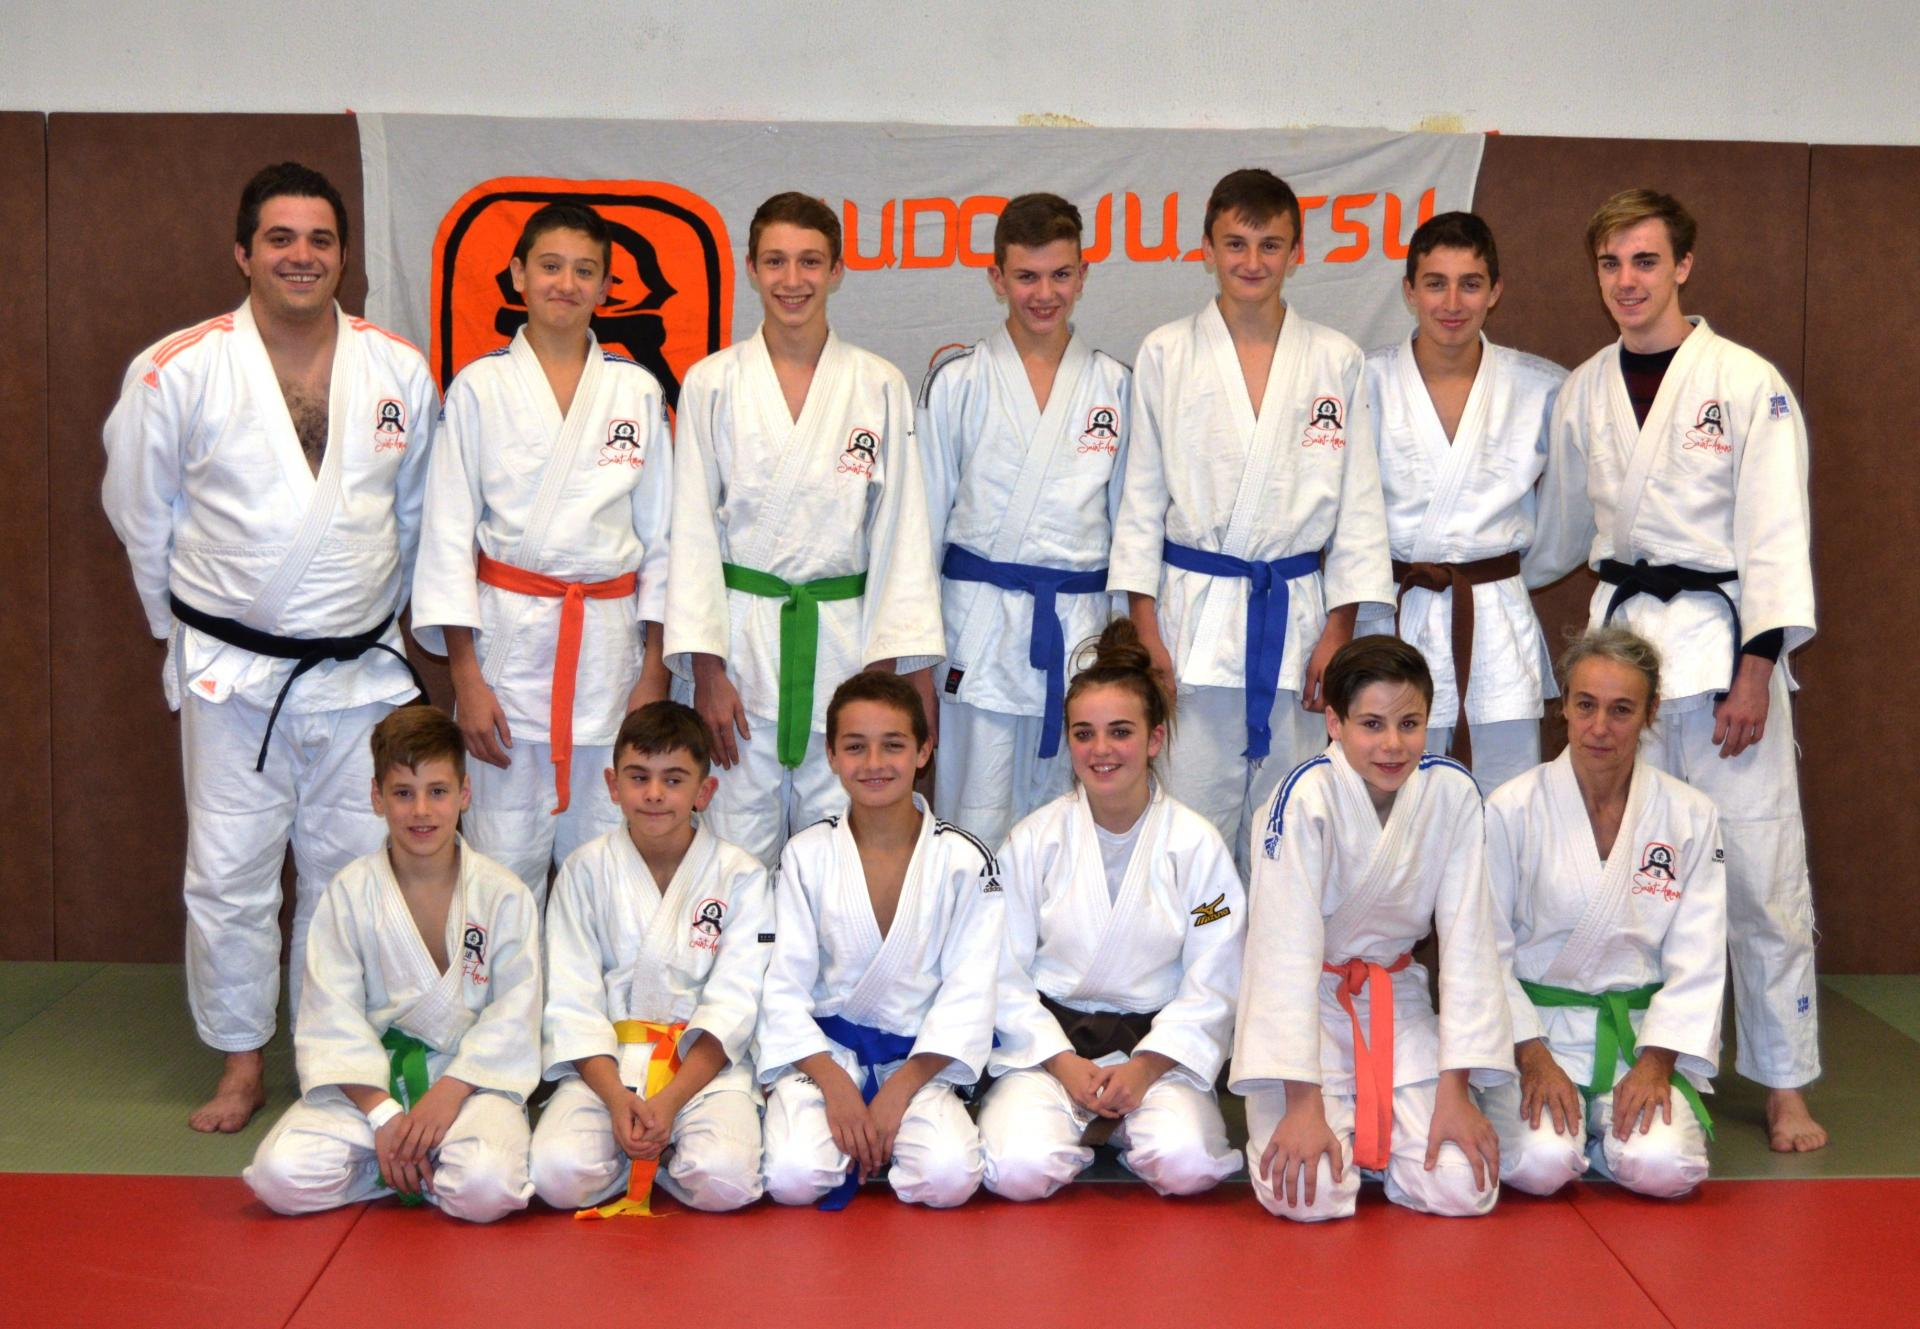 Groupe Judo Jujitsu Ado/Adultes (Novembre 2017)